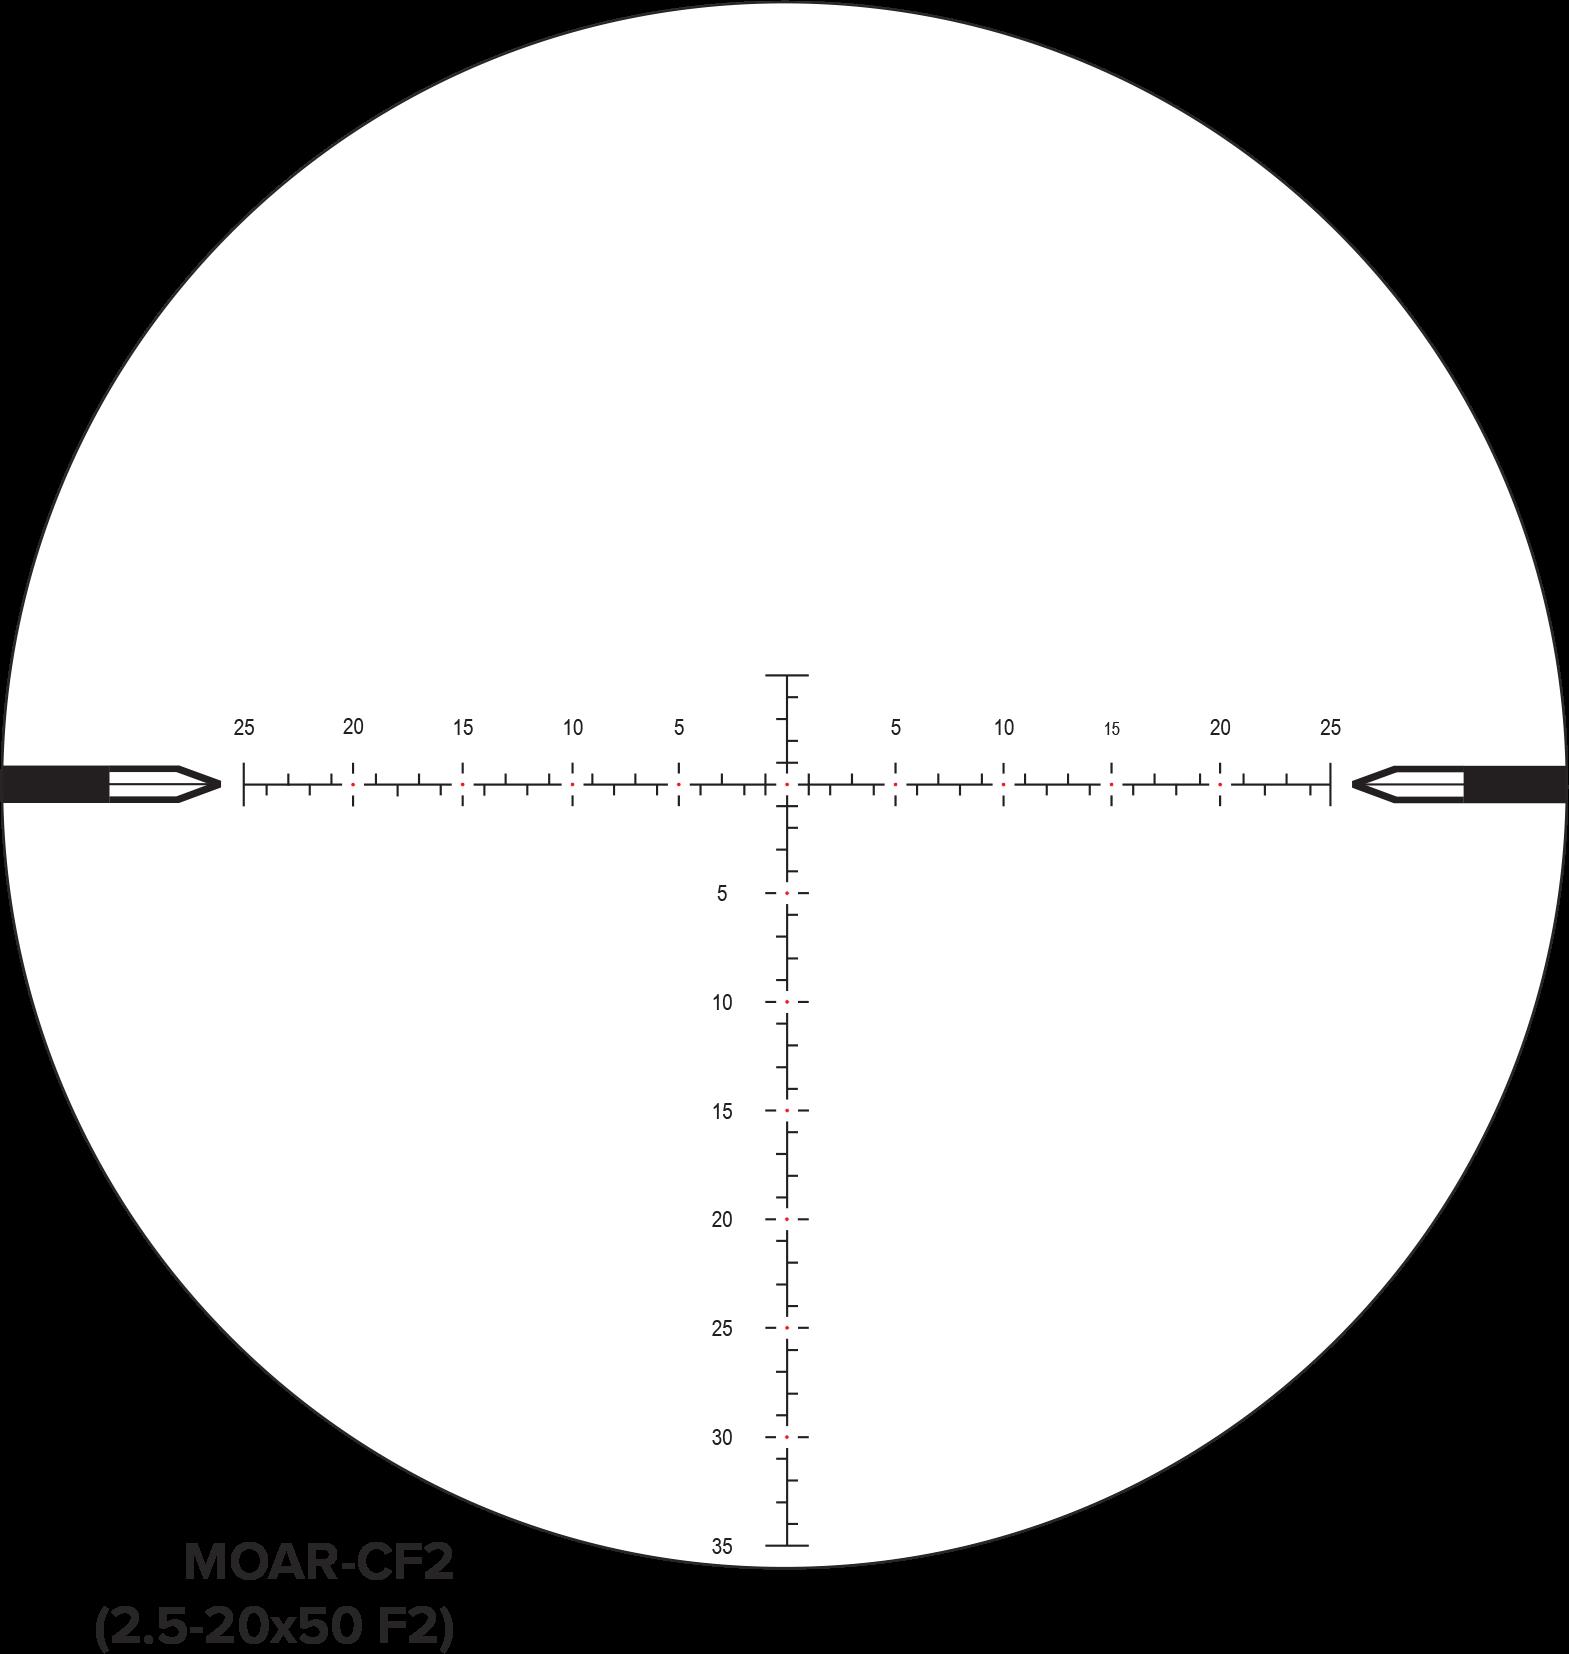 Reticle_Images - MOAR-CF2